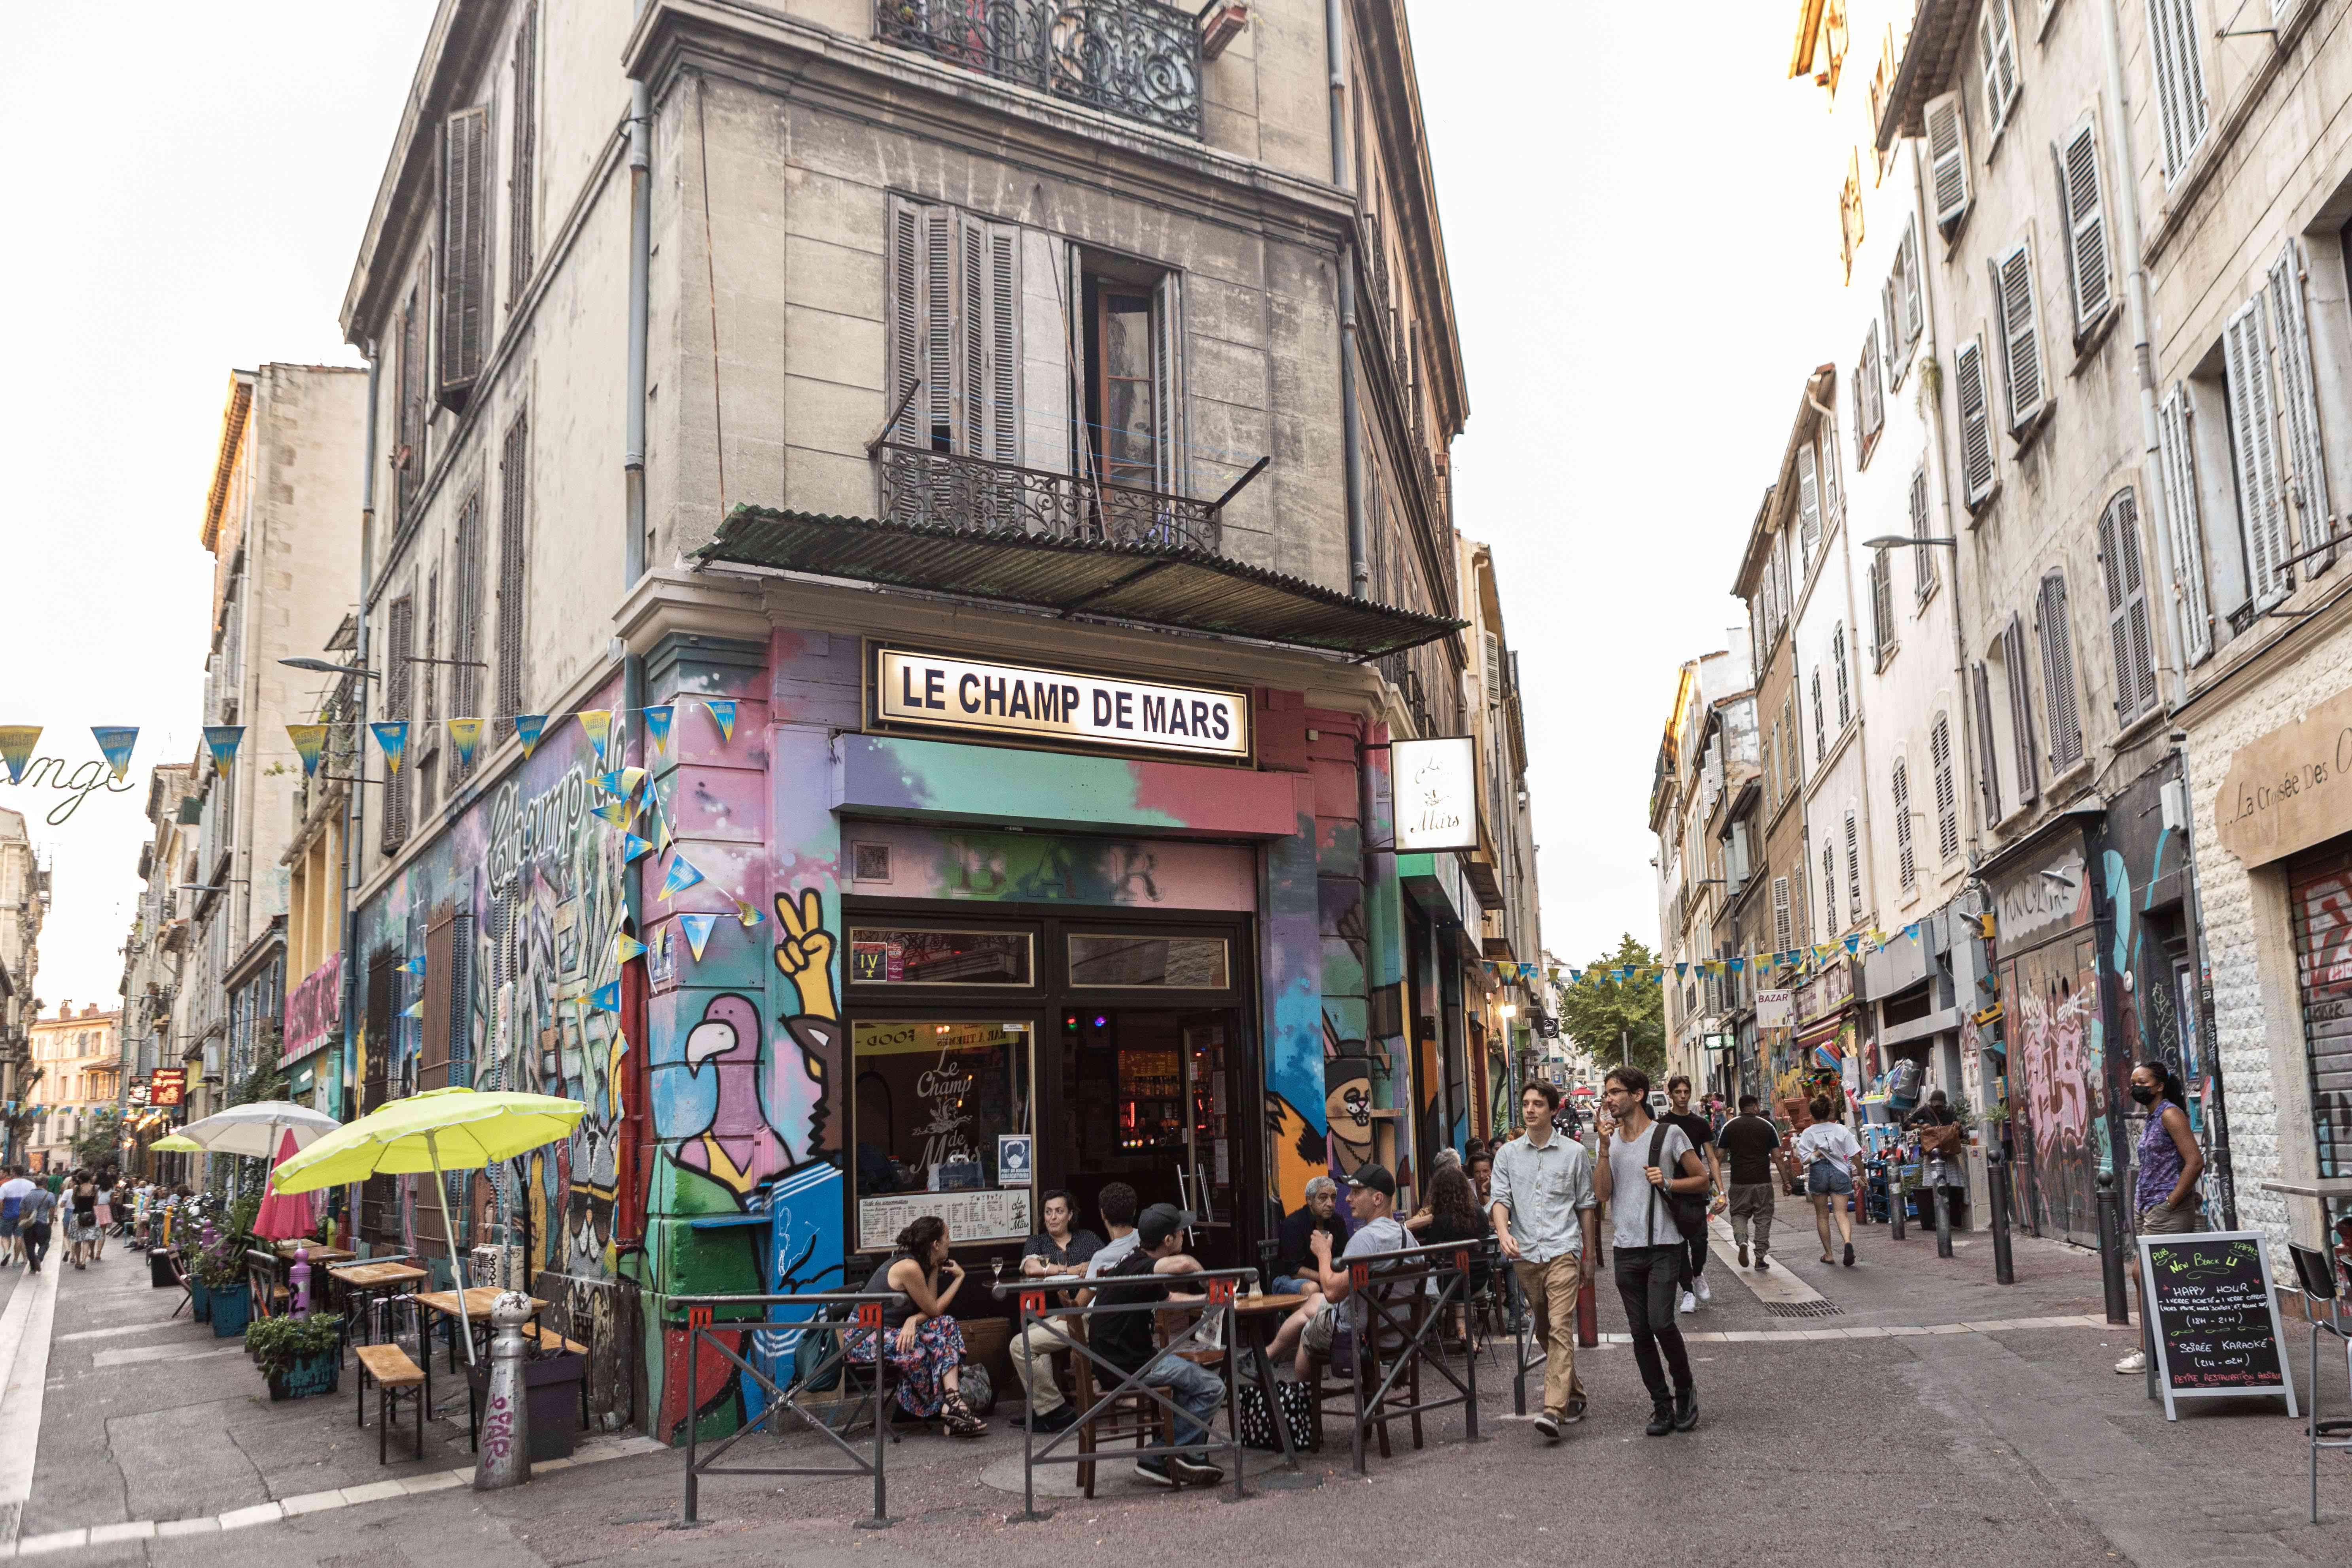 People walking around Cours Julien